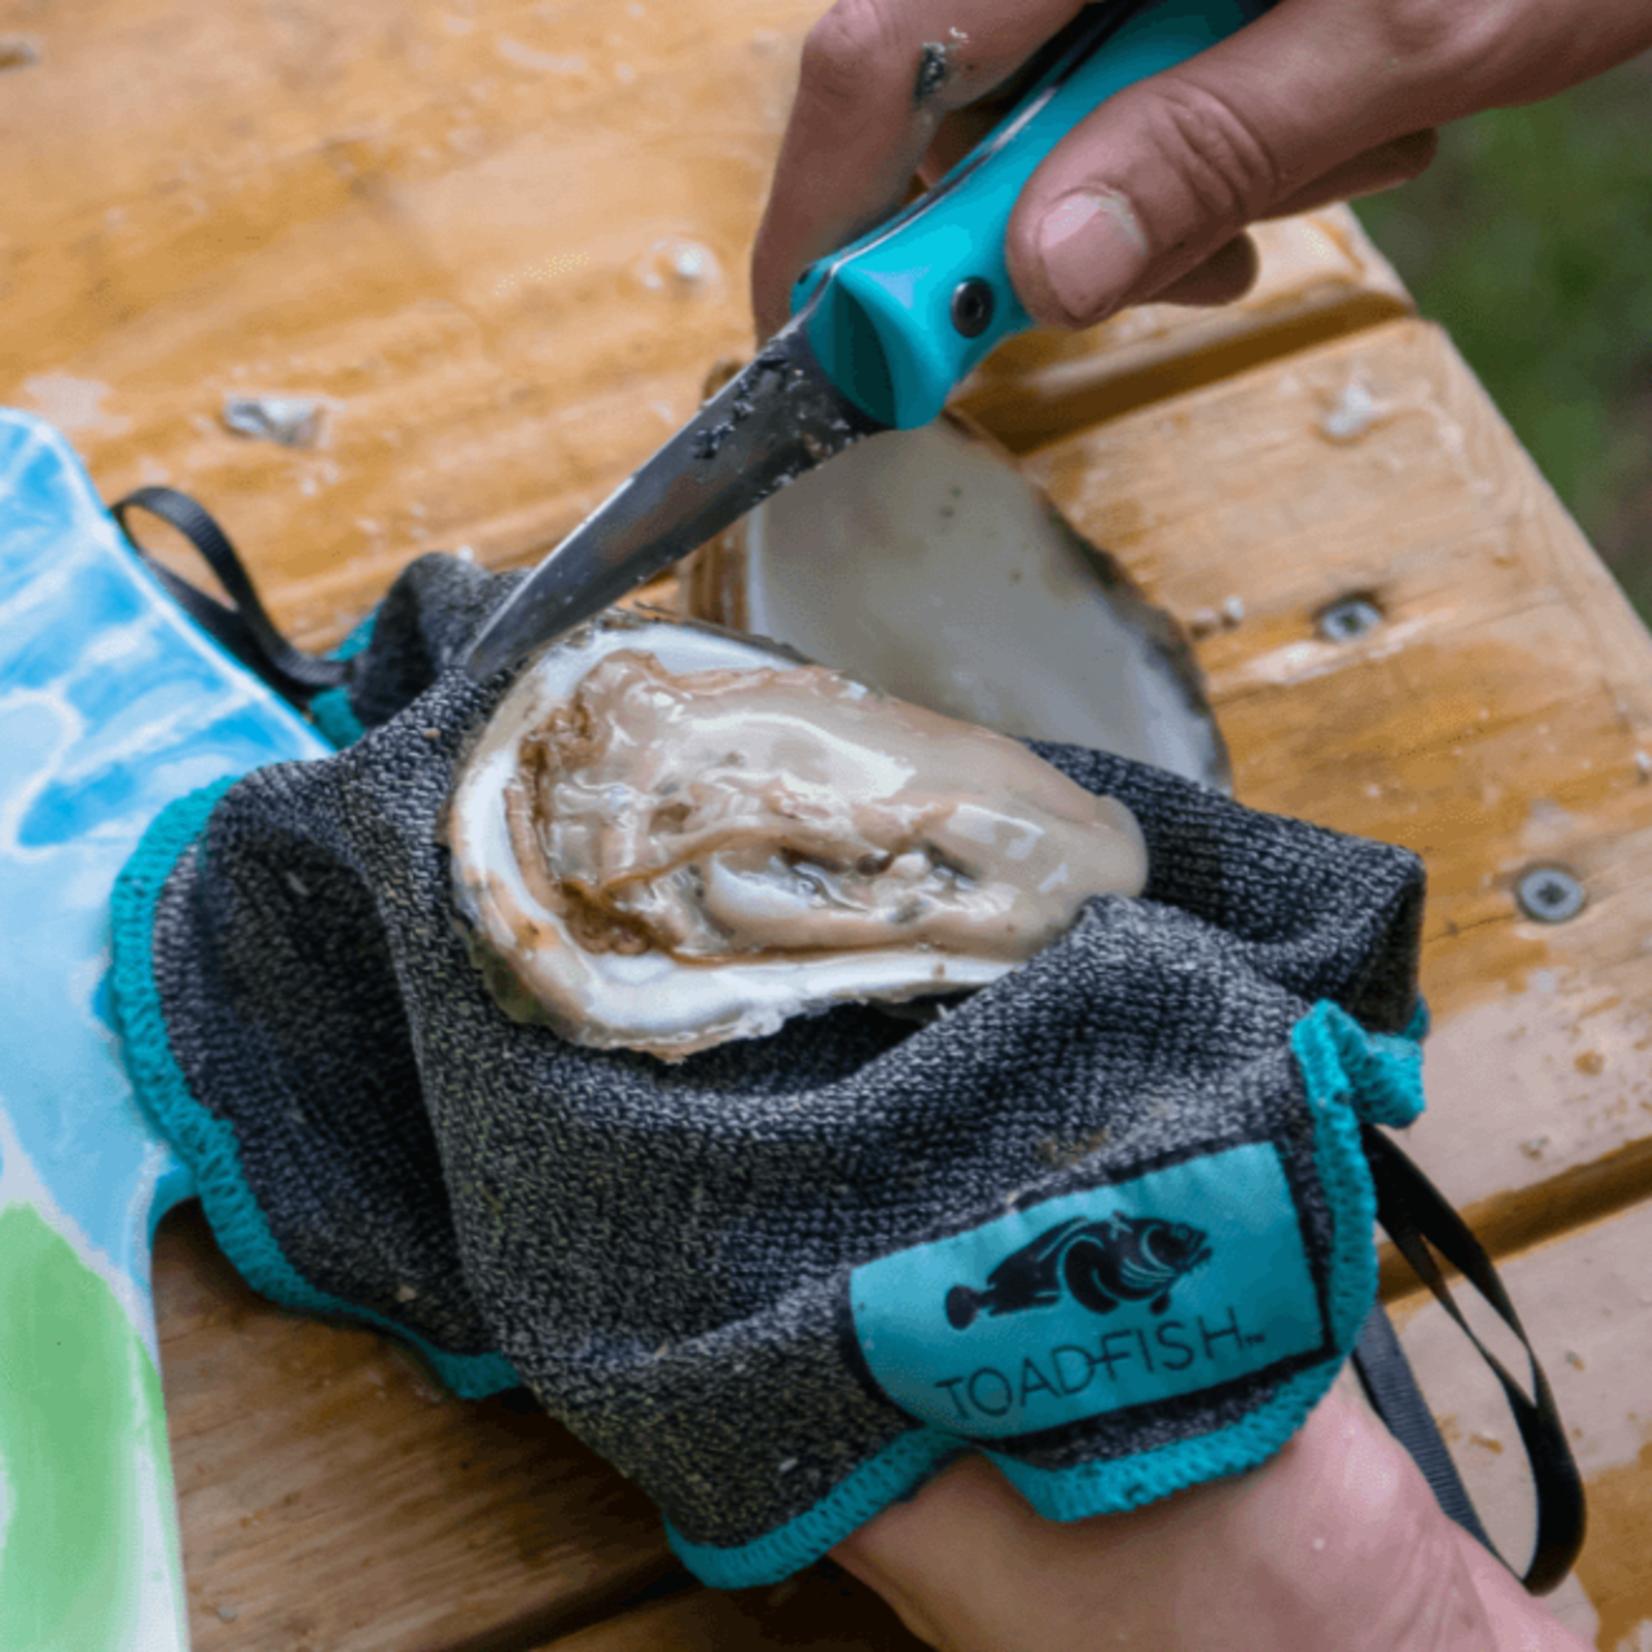 toadfish Toadfish PUT 'EM BACK Shucking Cloth